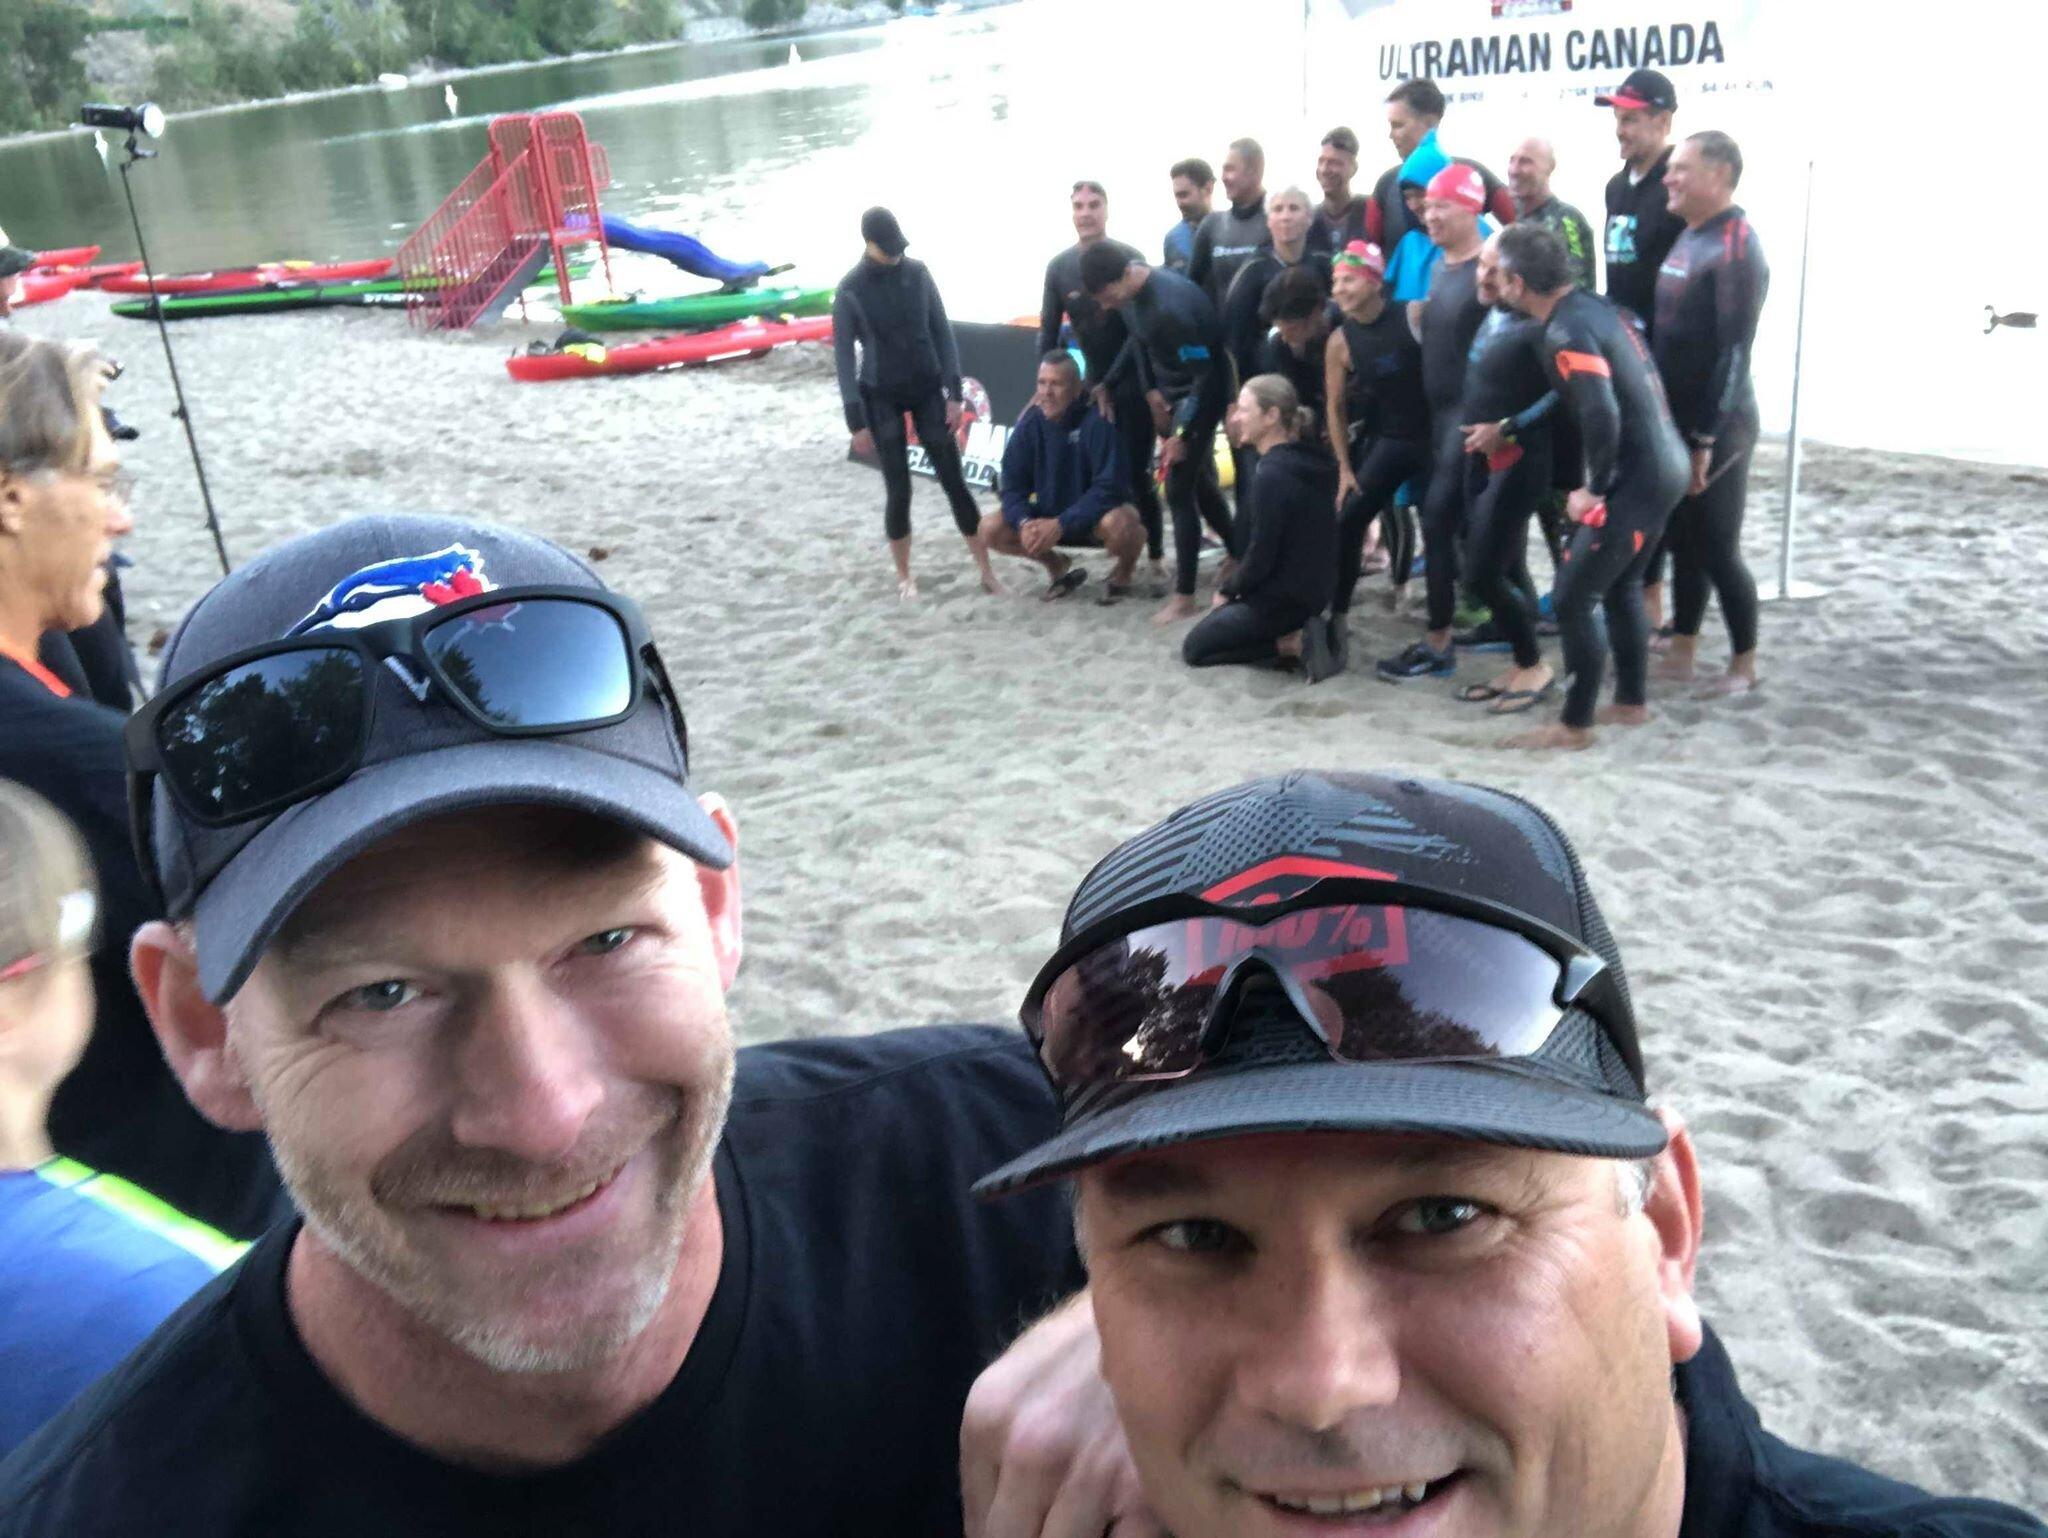 Coach_Terry_Wilson_Pursuit_of_The_Perfect_Race_Ultraman_Canada_Tim_Wilkinson_Swim.jpg